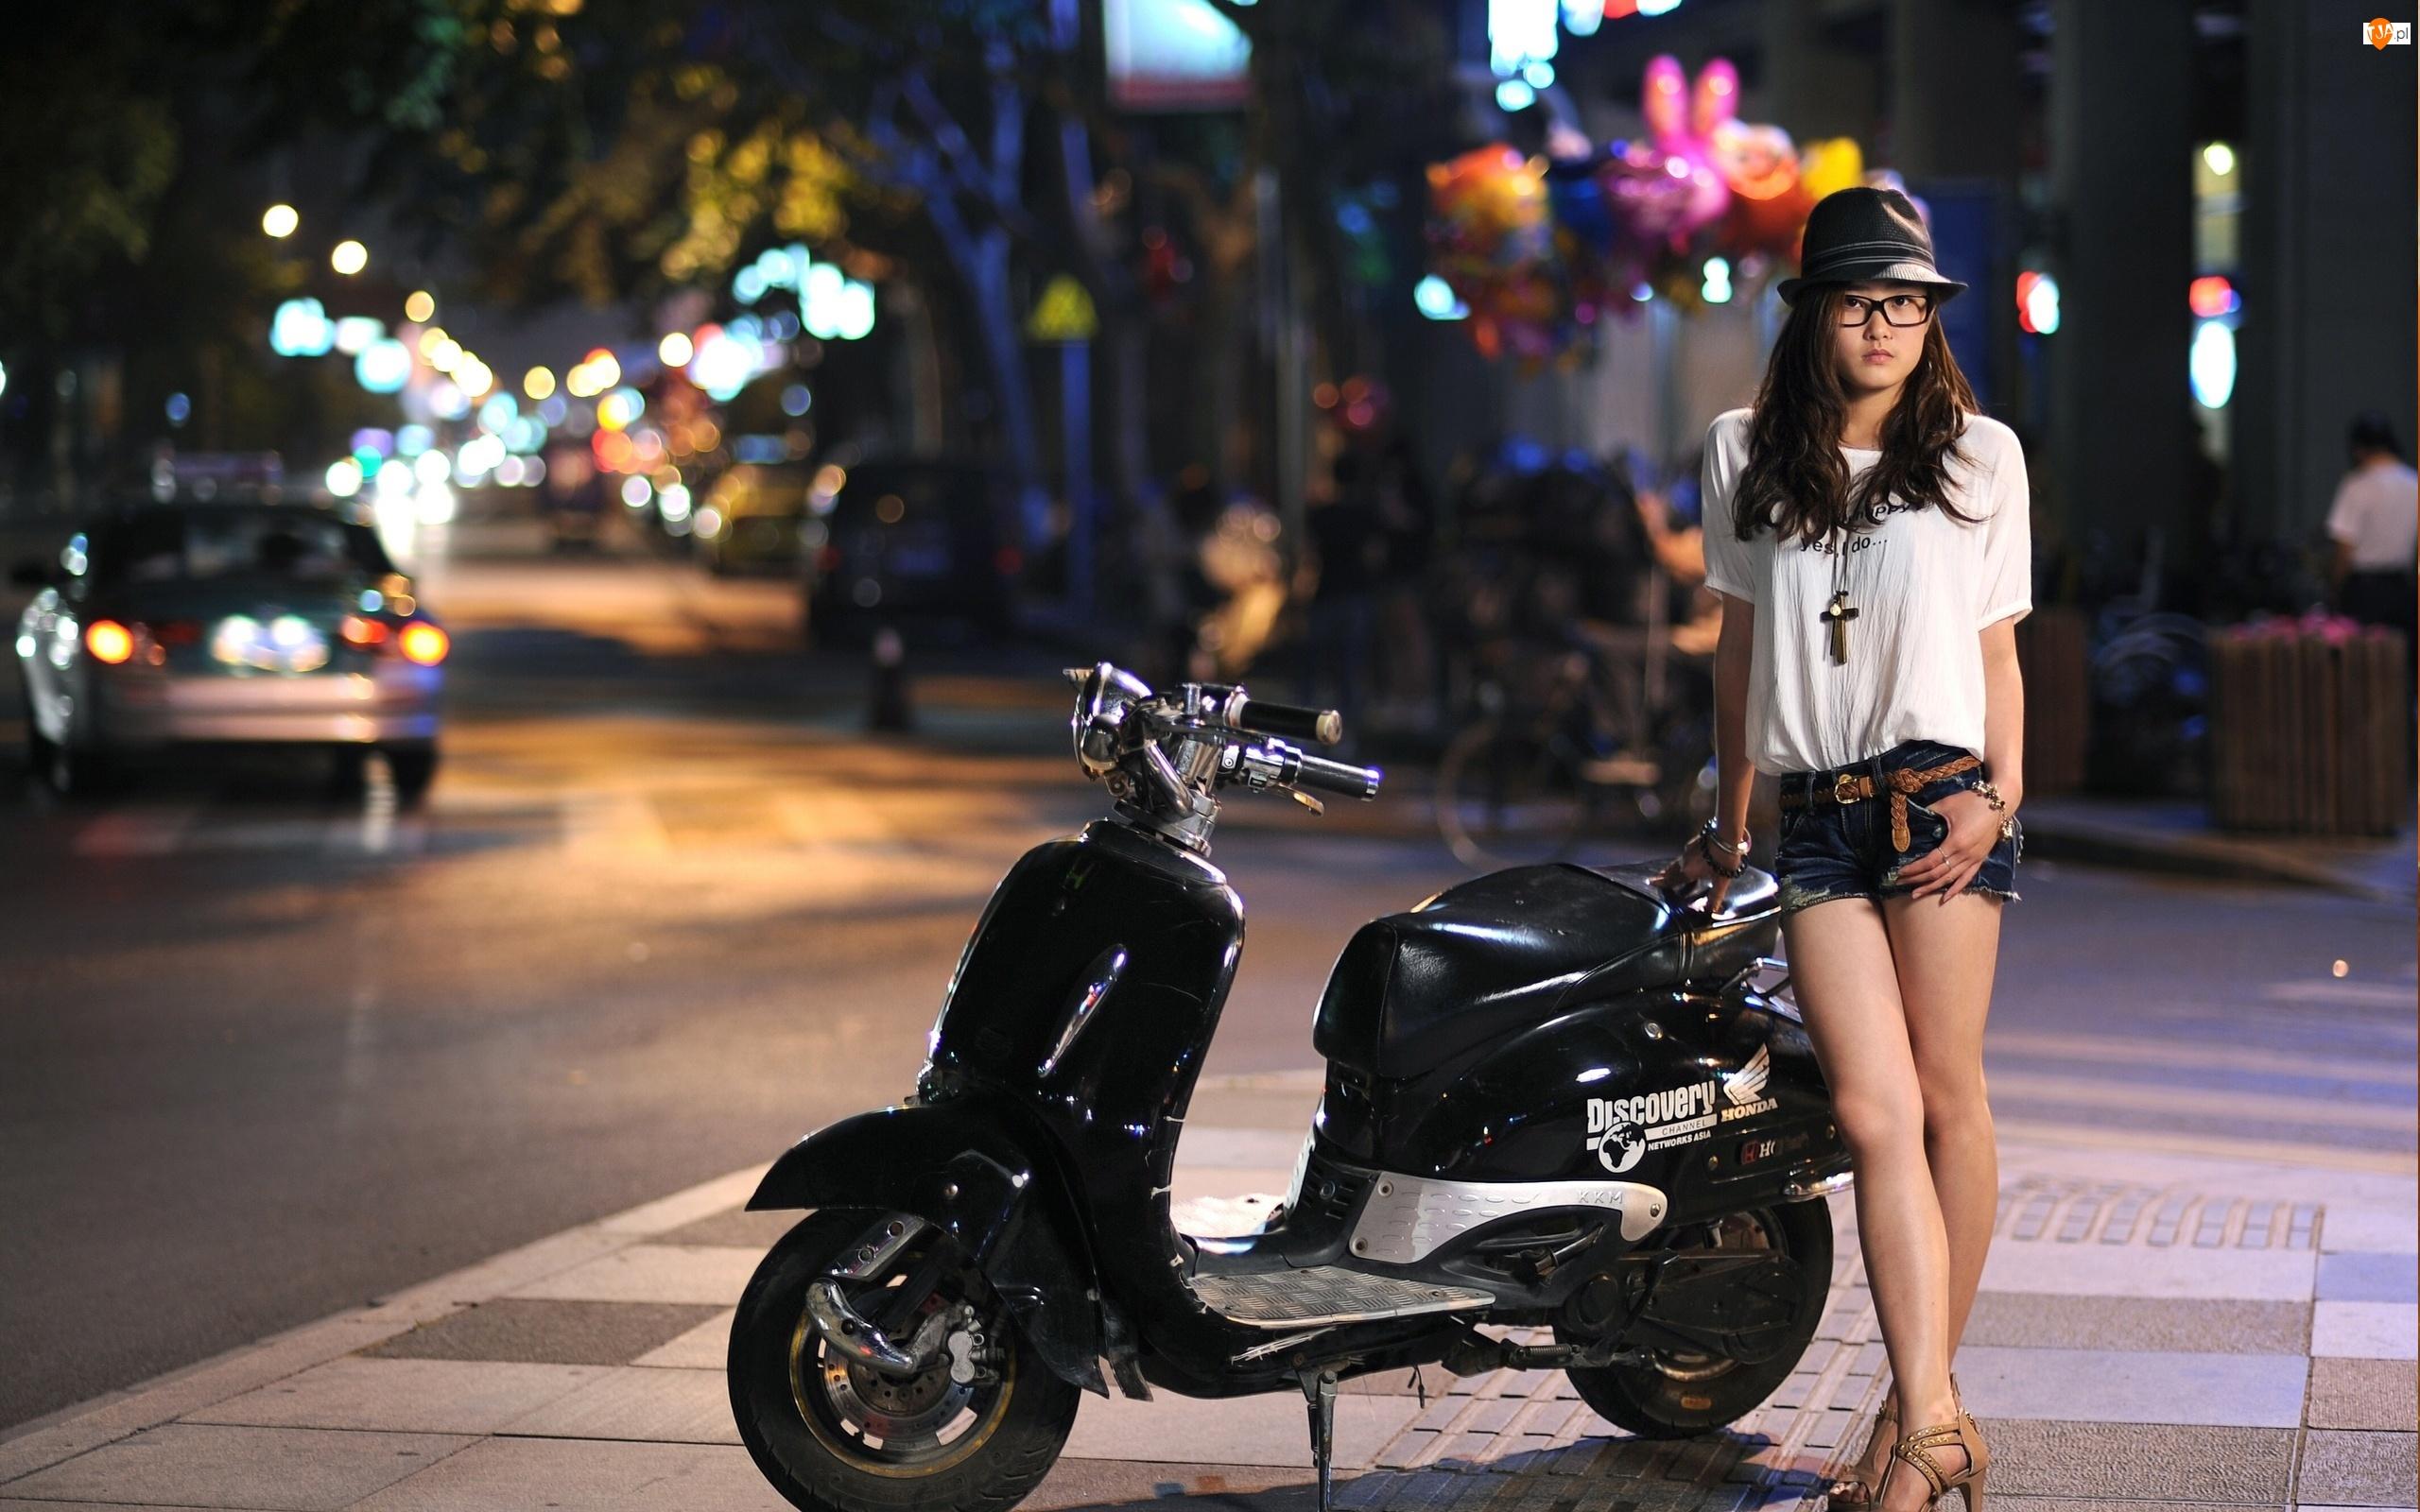 Honda, Kapelusz, Motocykl, Okulary, Channel, Kobieta